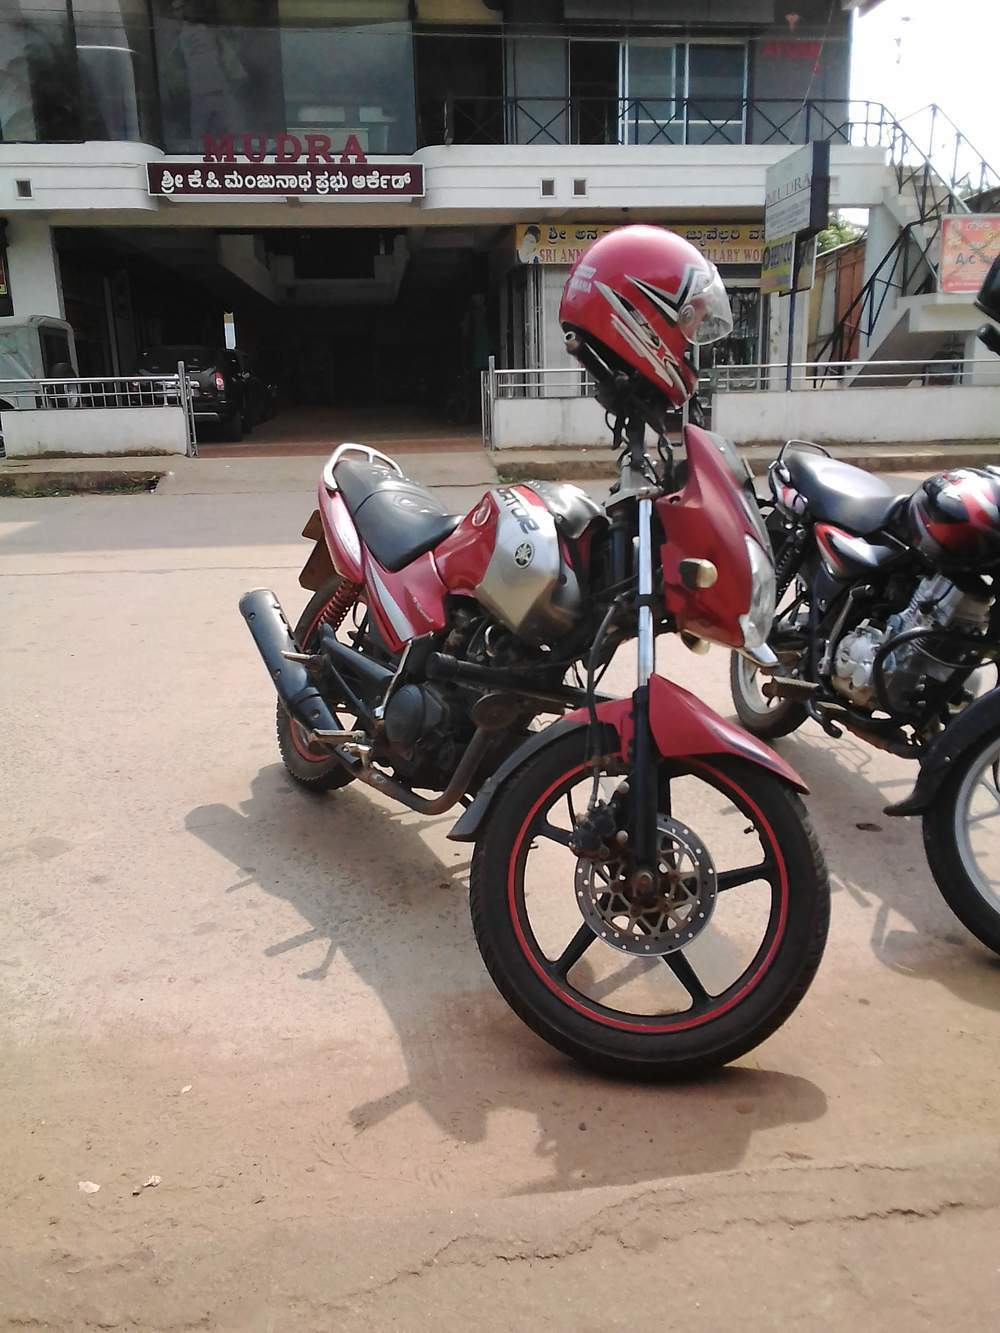 Yamaha Vmax 2019 Price In India